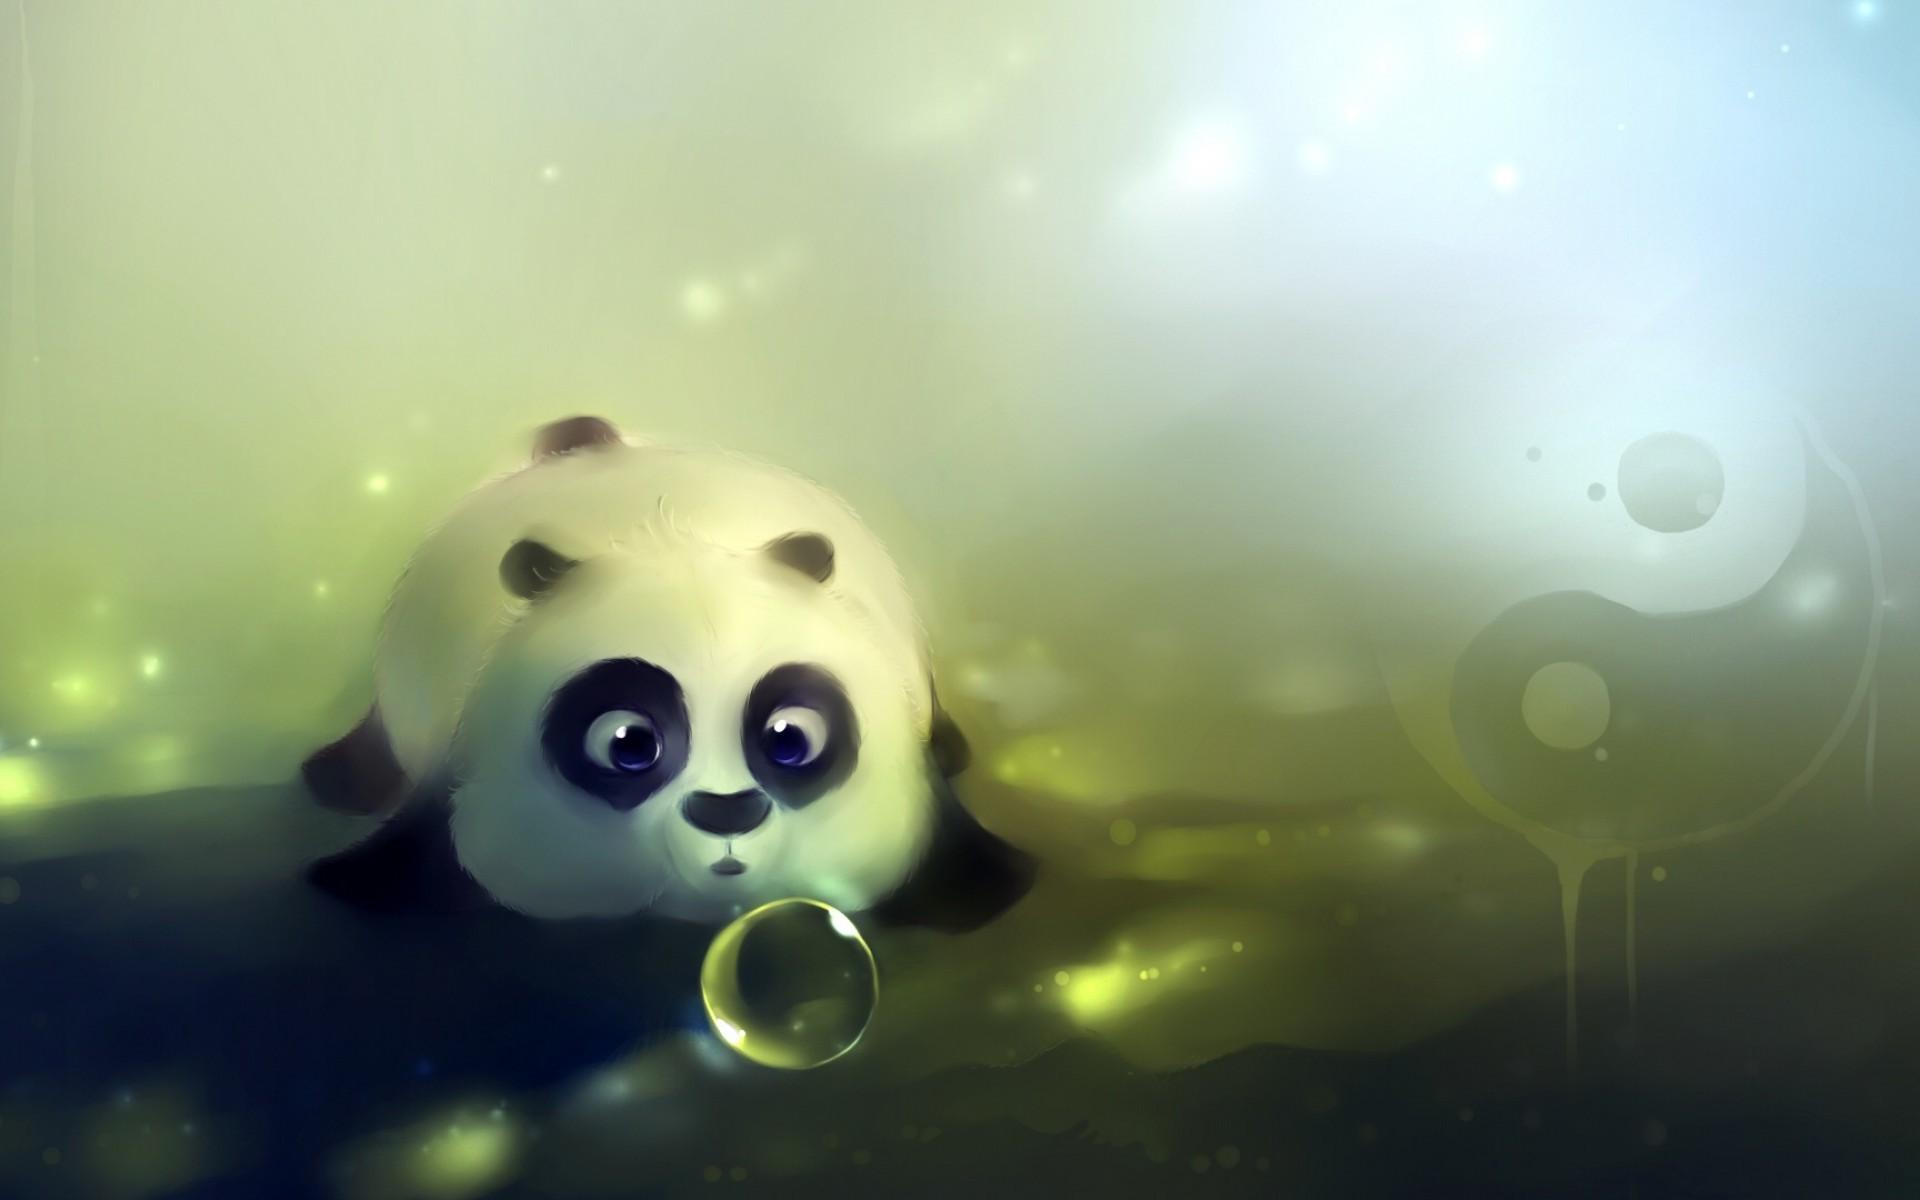 Cute Wallpaper HD